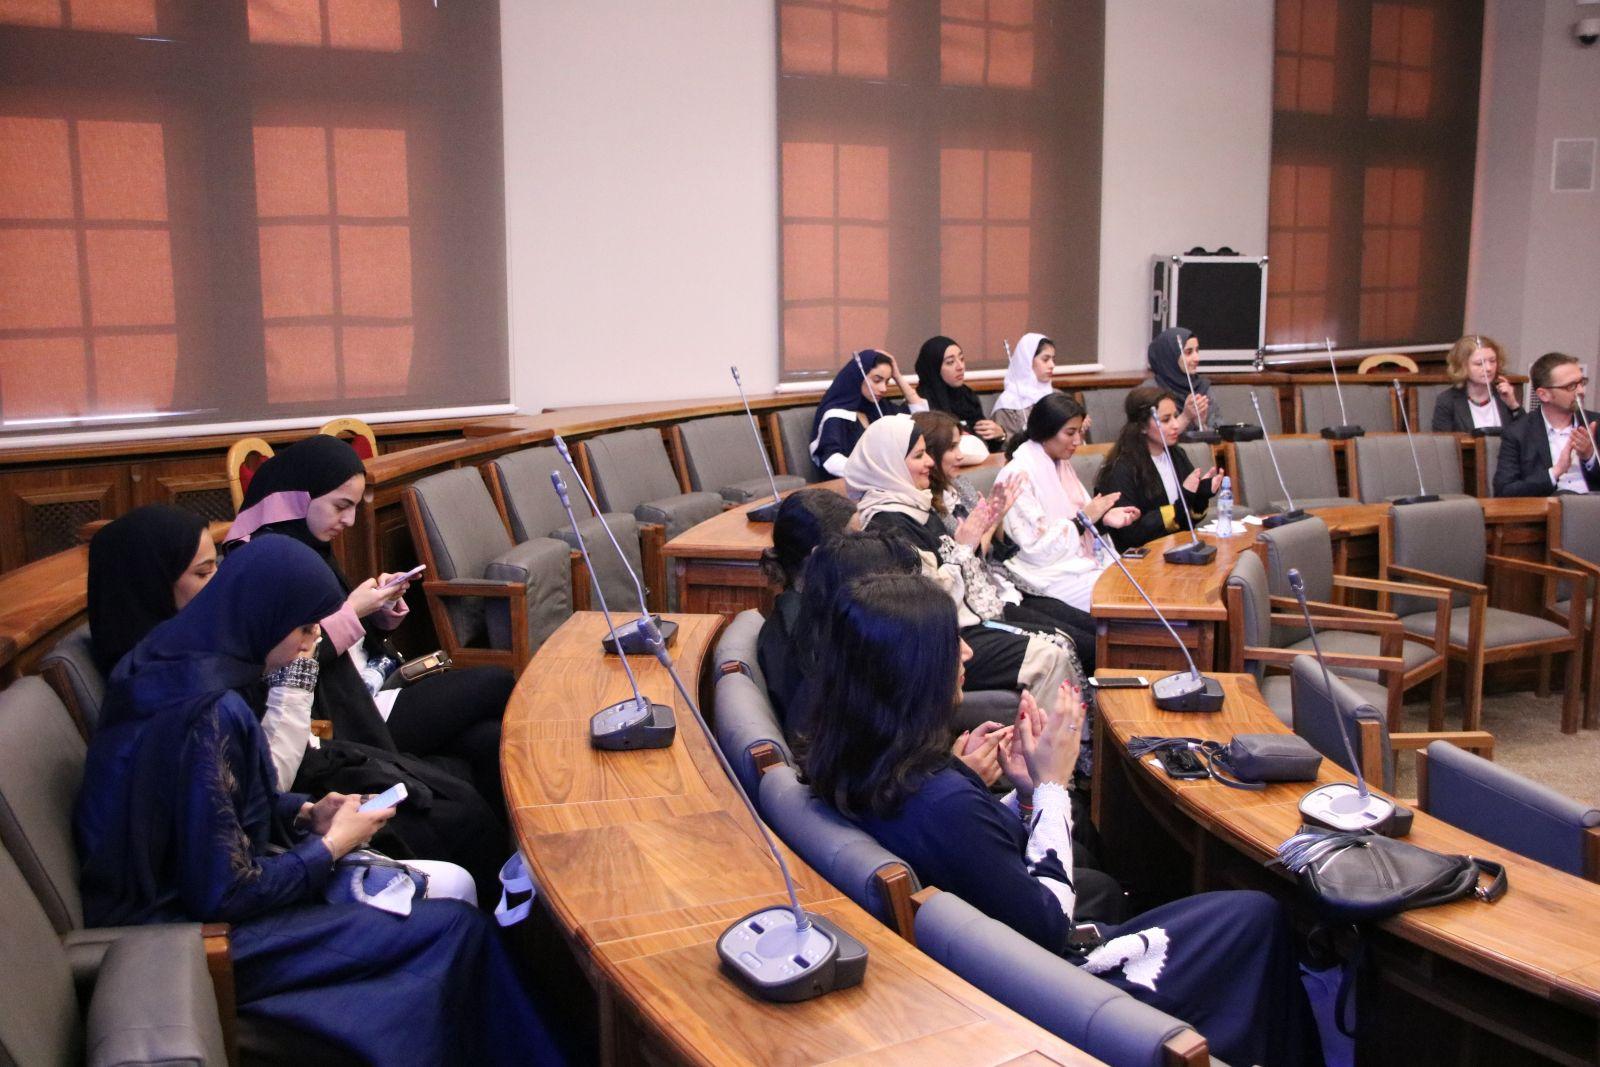 Delegacja z Prince Sultan University z Arabii Saudyjskiej